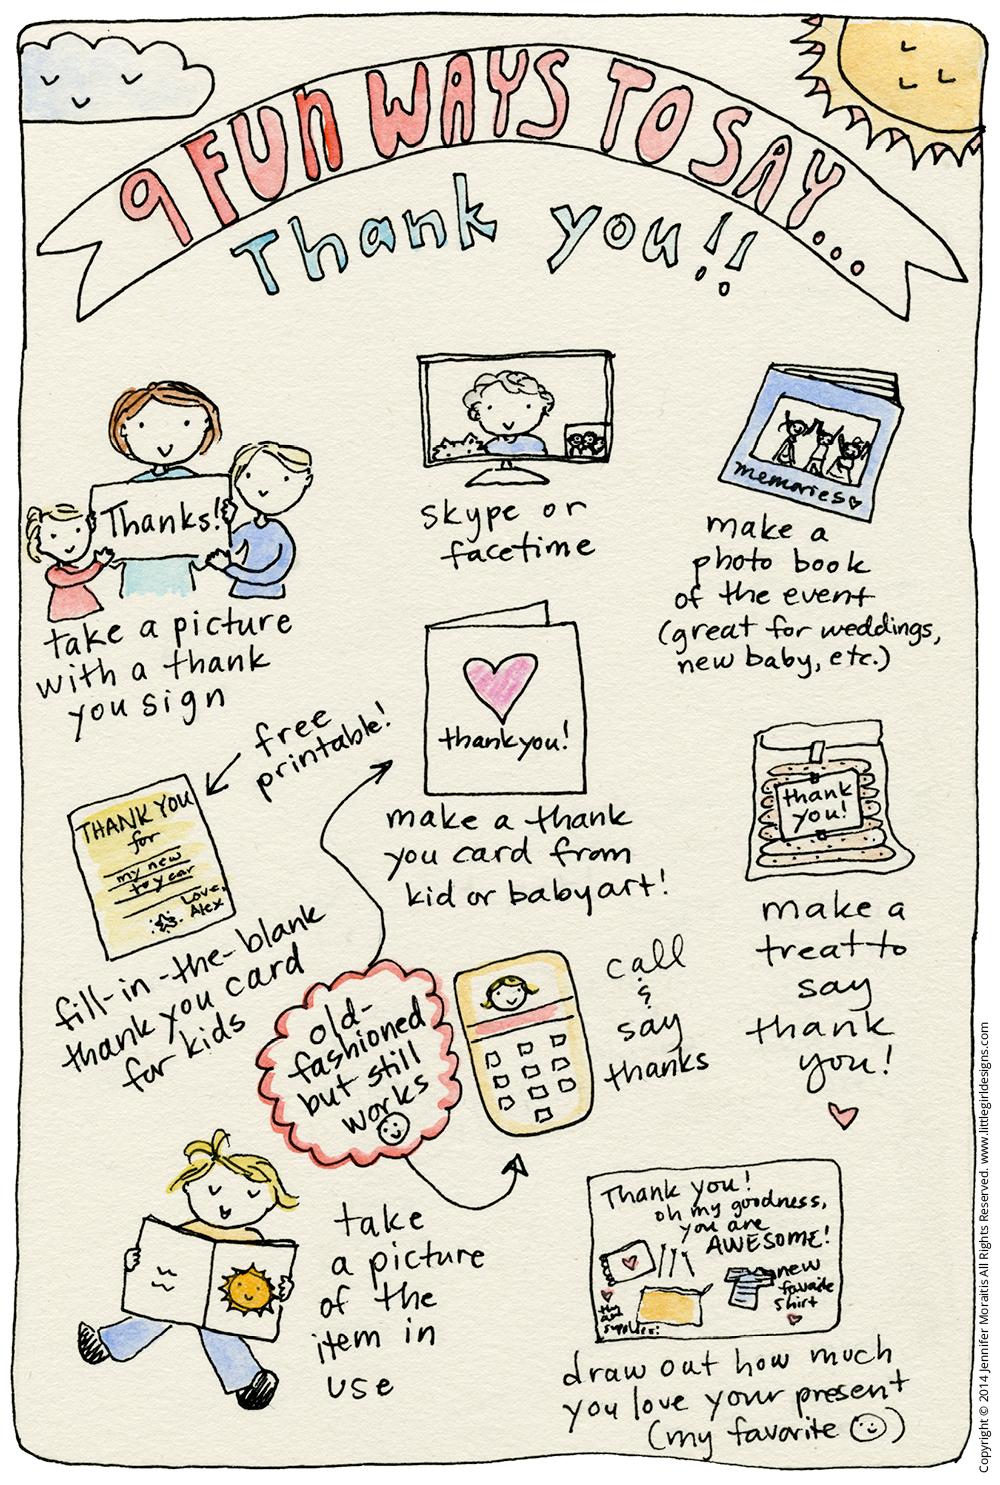 9 Fun Ways To Say Thank You Sketch